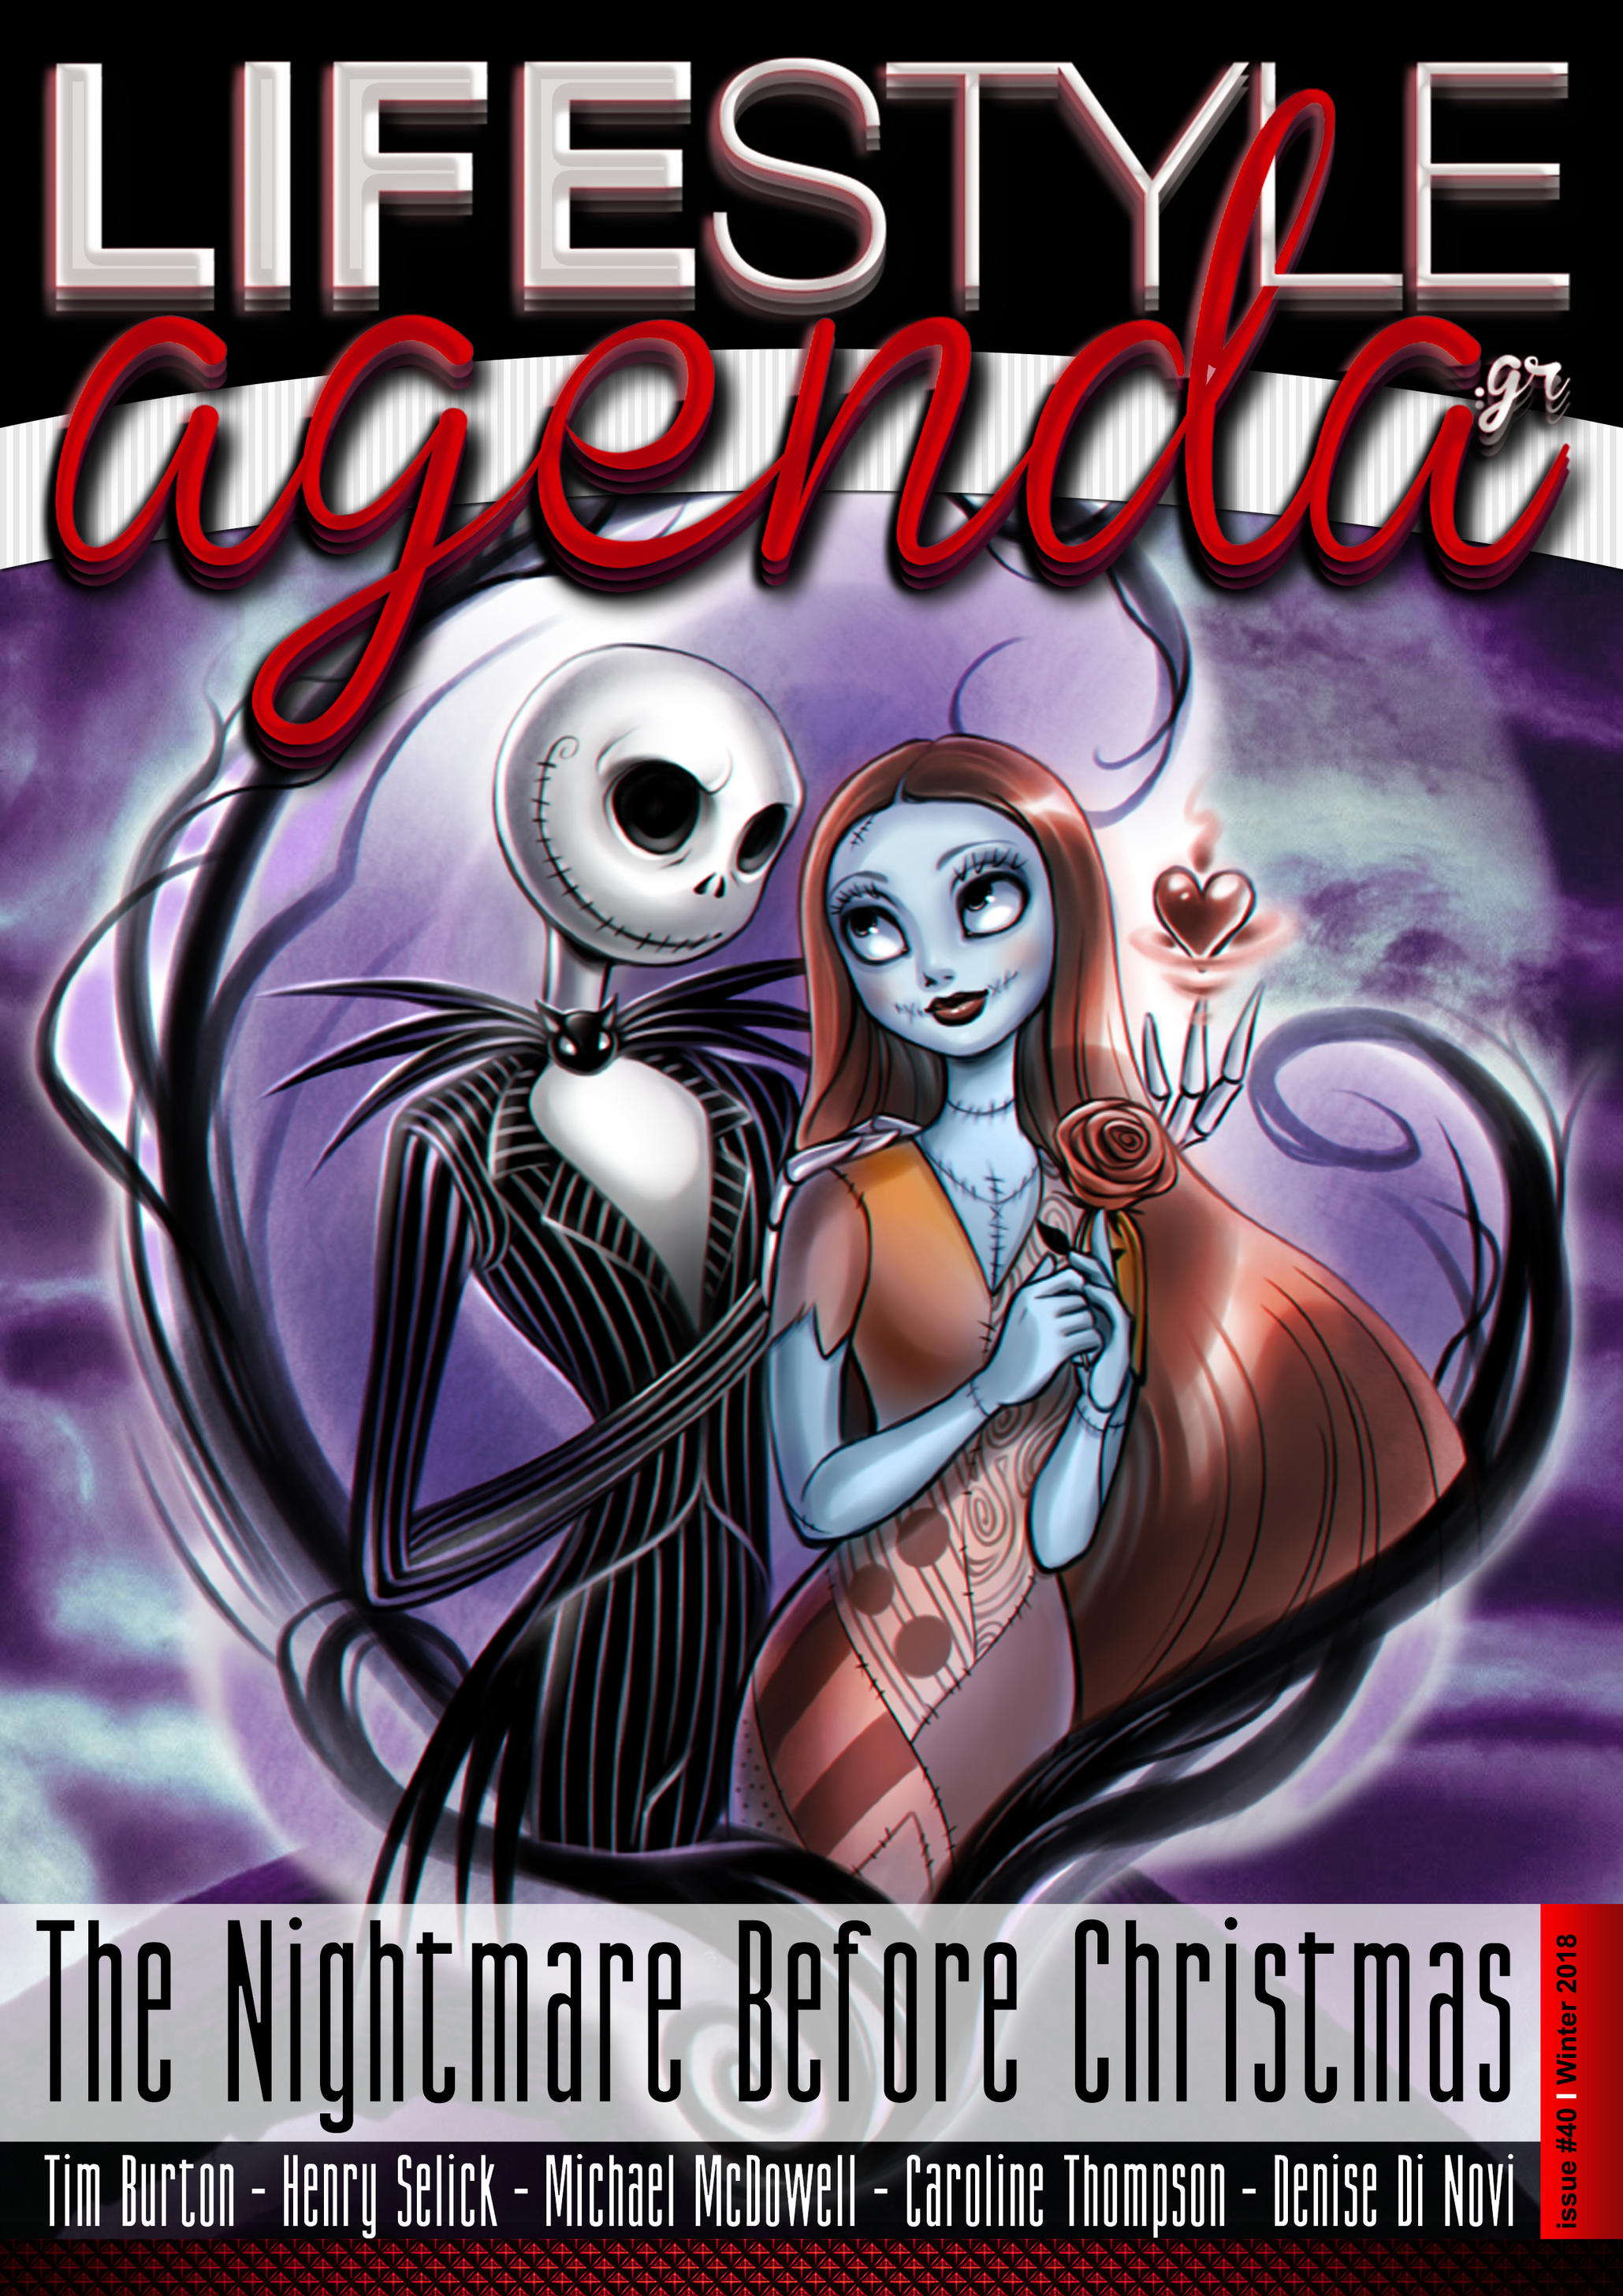 LifeStyle Agenda issue #40th / Magazine Cover by LifeStyleAgenda